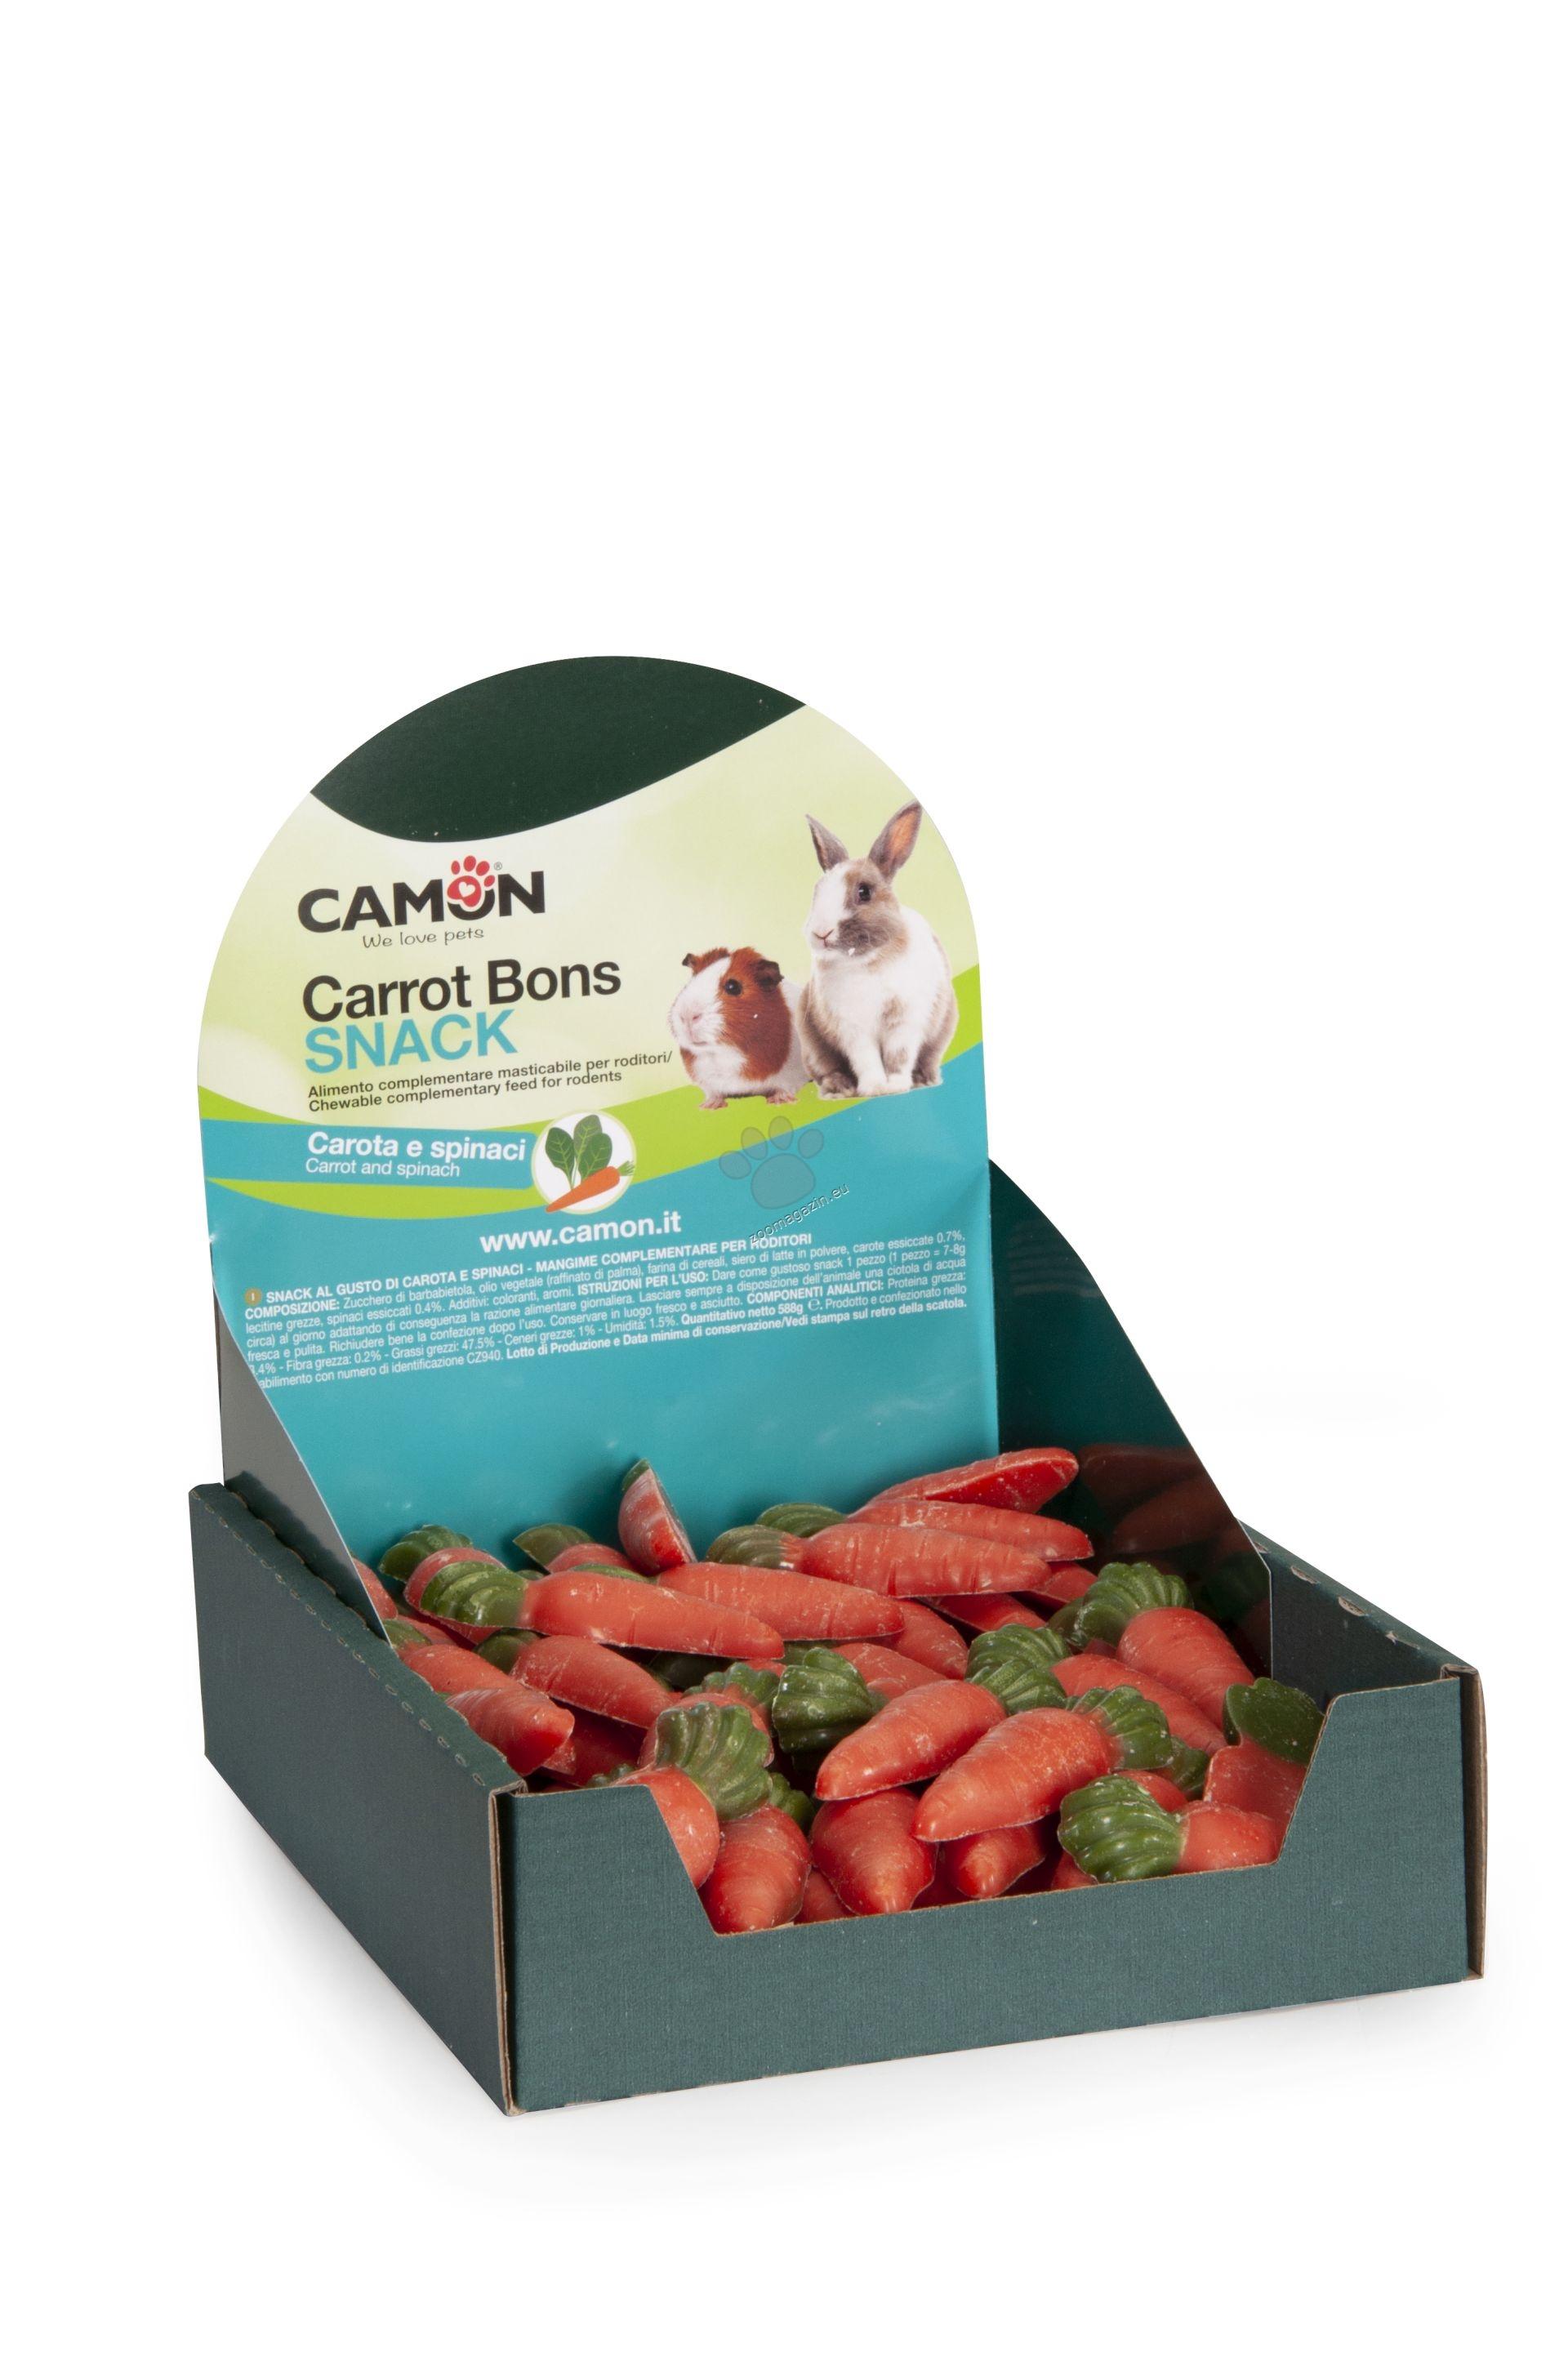 Camon Carrot Bons Snack - деликатесно лакомство с моркови, за мини зайчета 84 броя